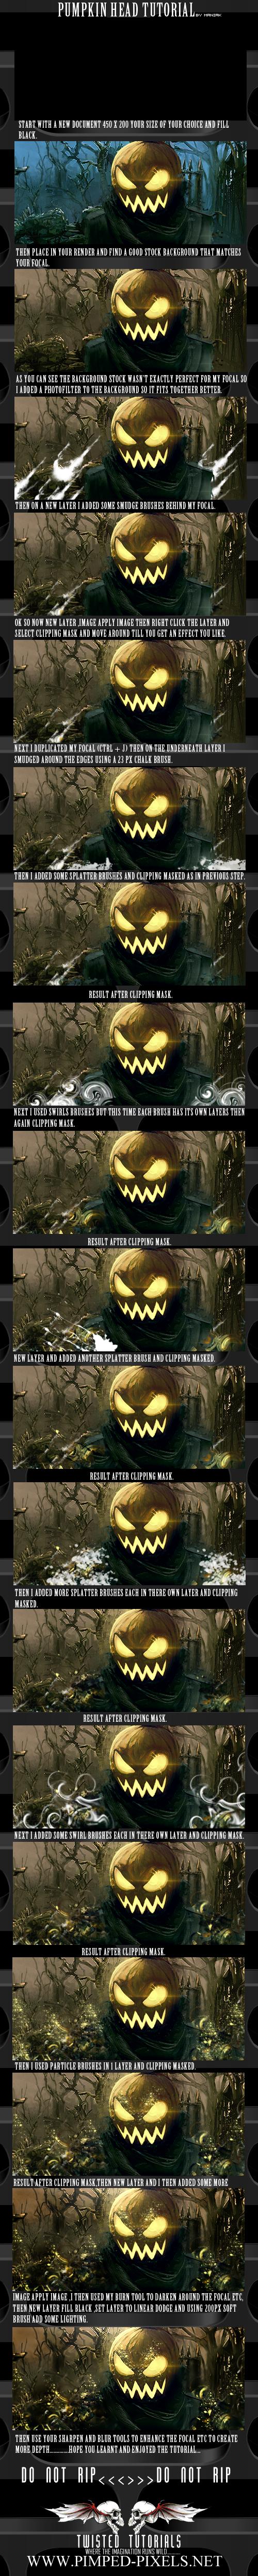 Pumpkin Head Tutorial by Maniakuk